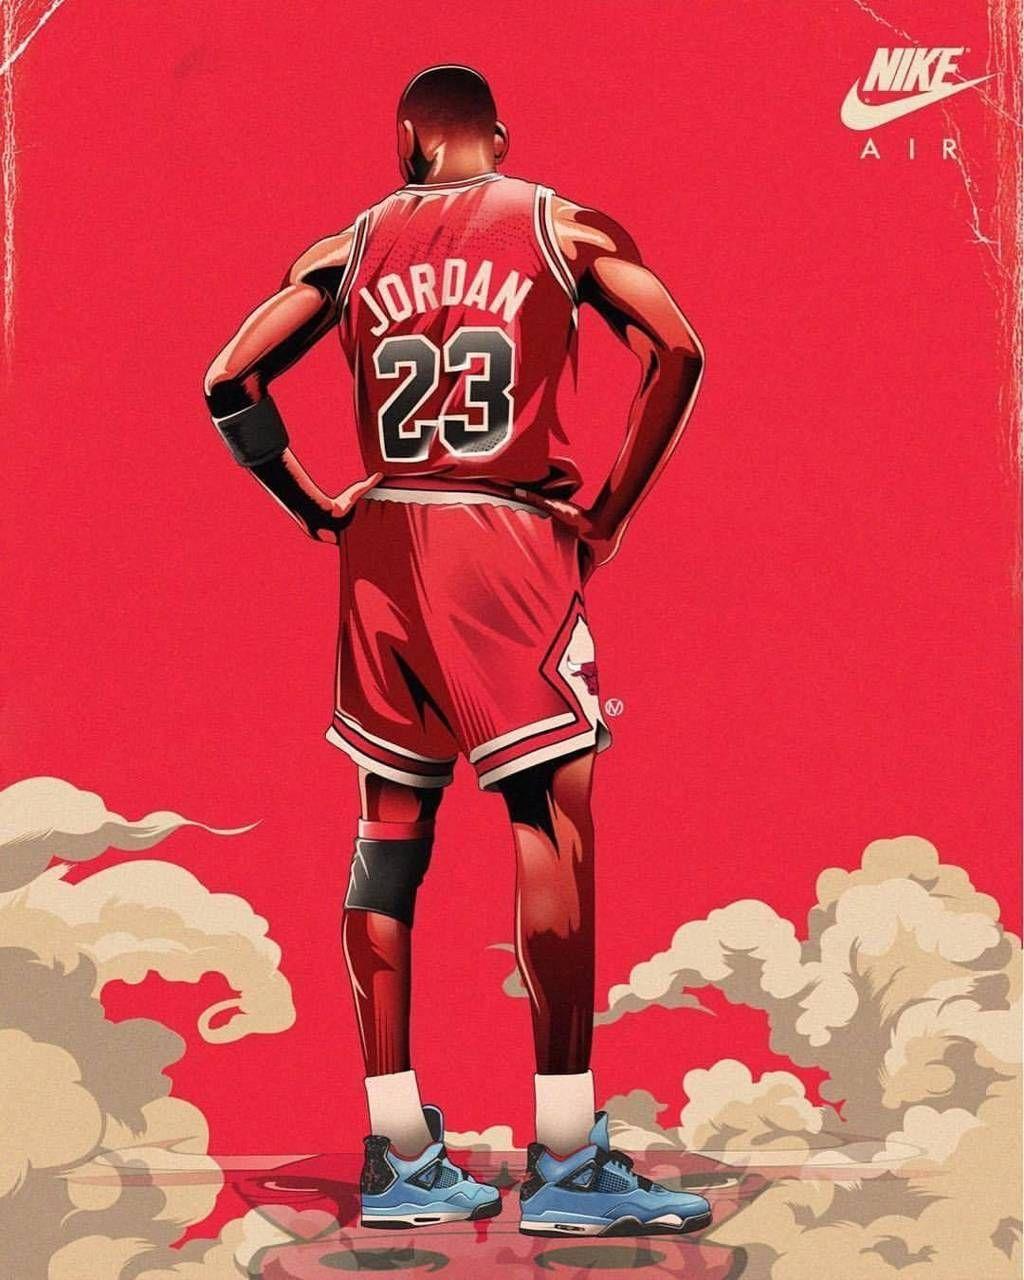 Download Jordan 23 Wallpaper By Bigpapi 89 2b Free On Zedge